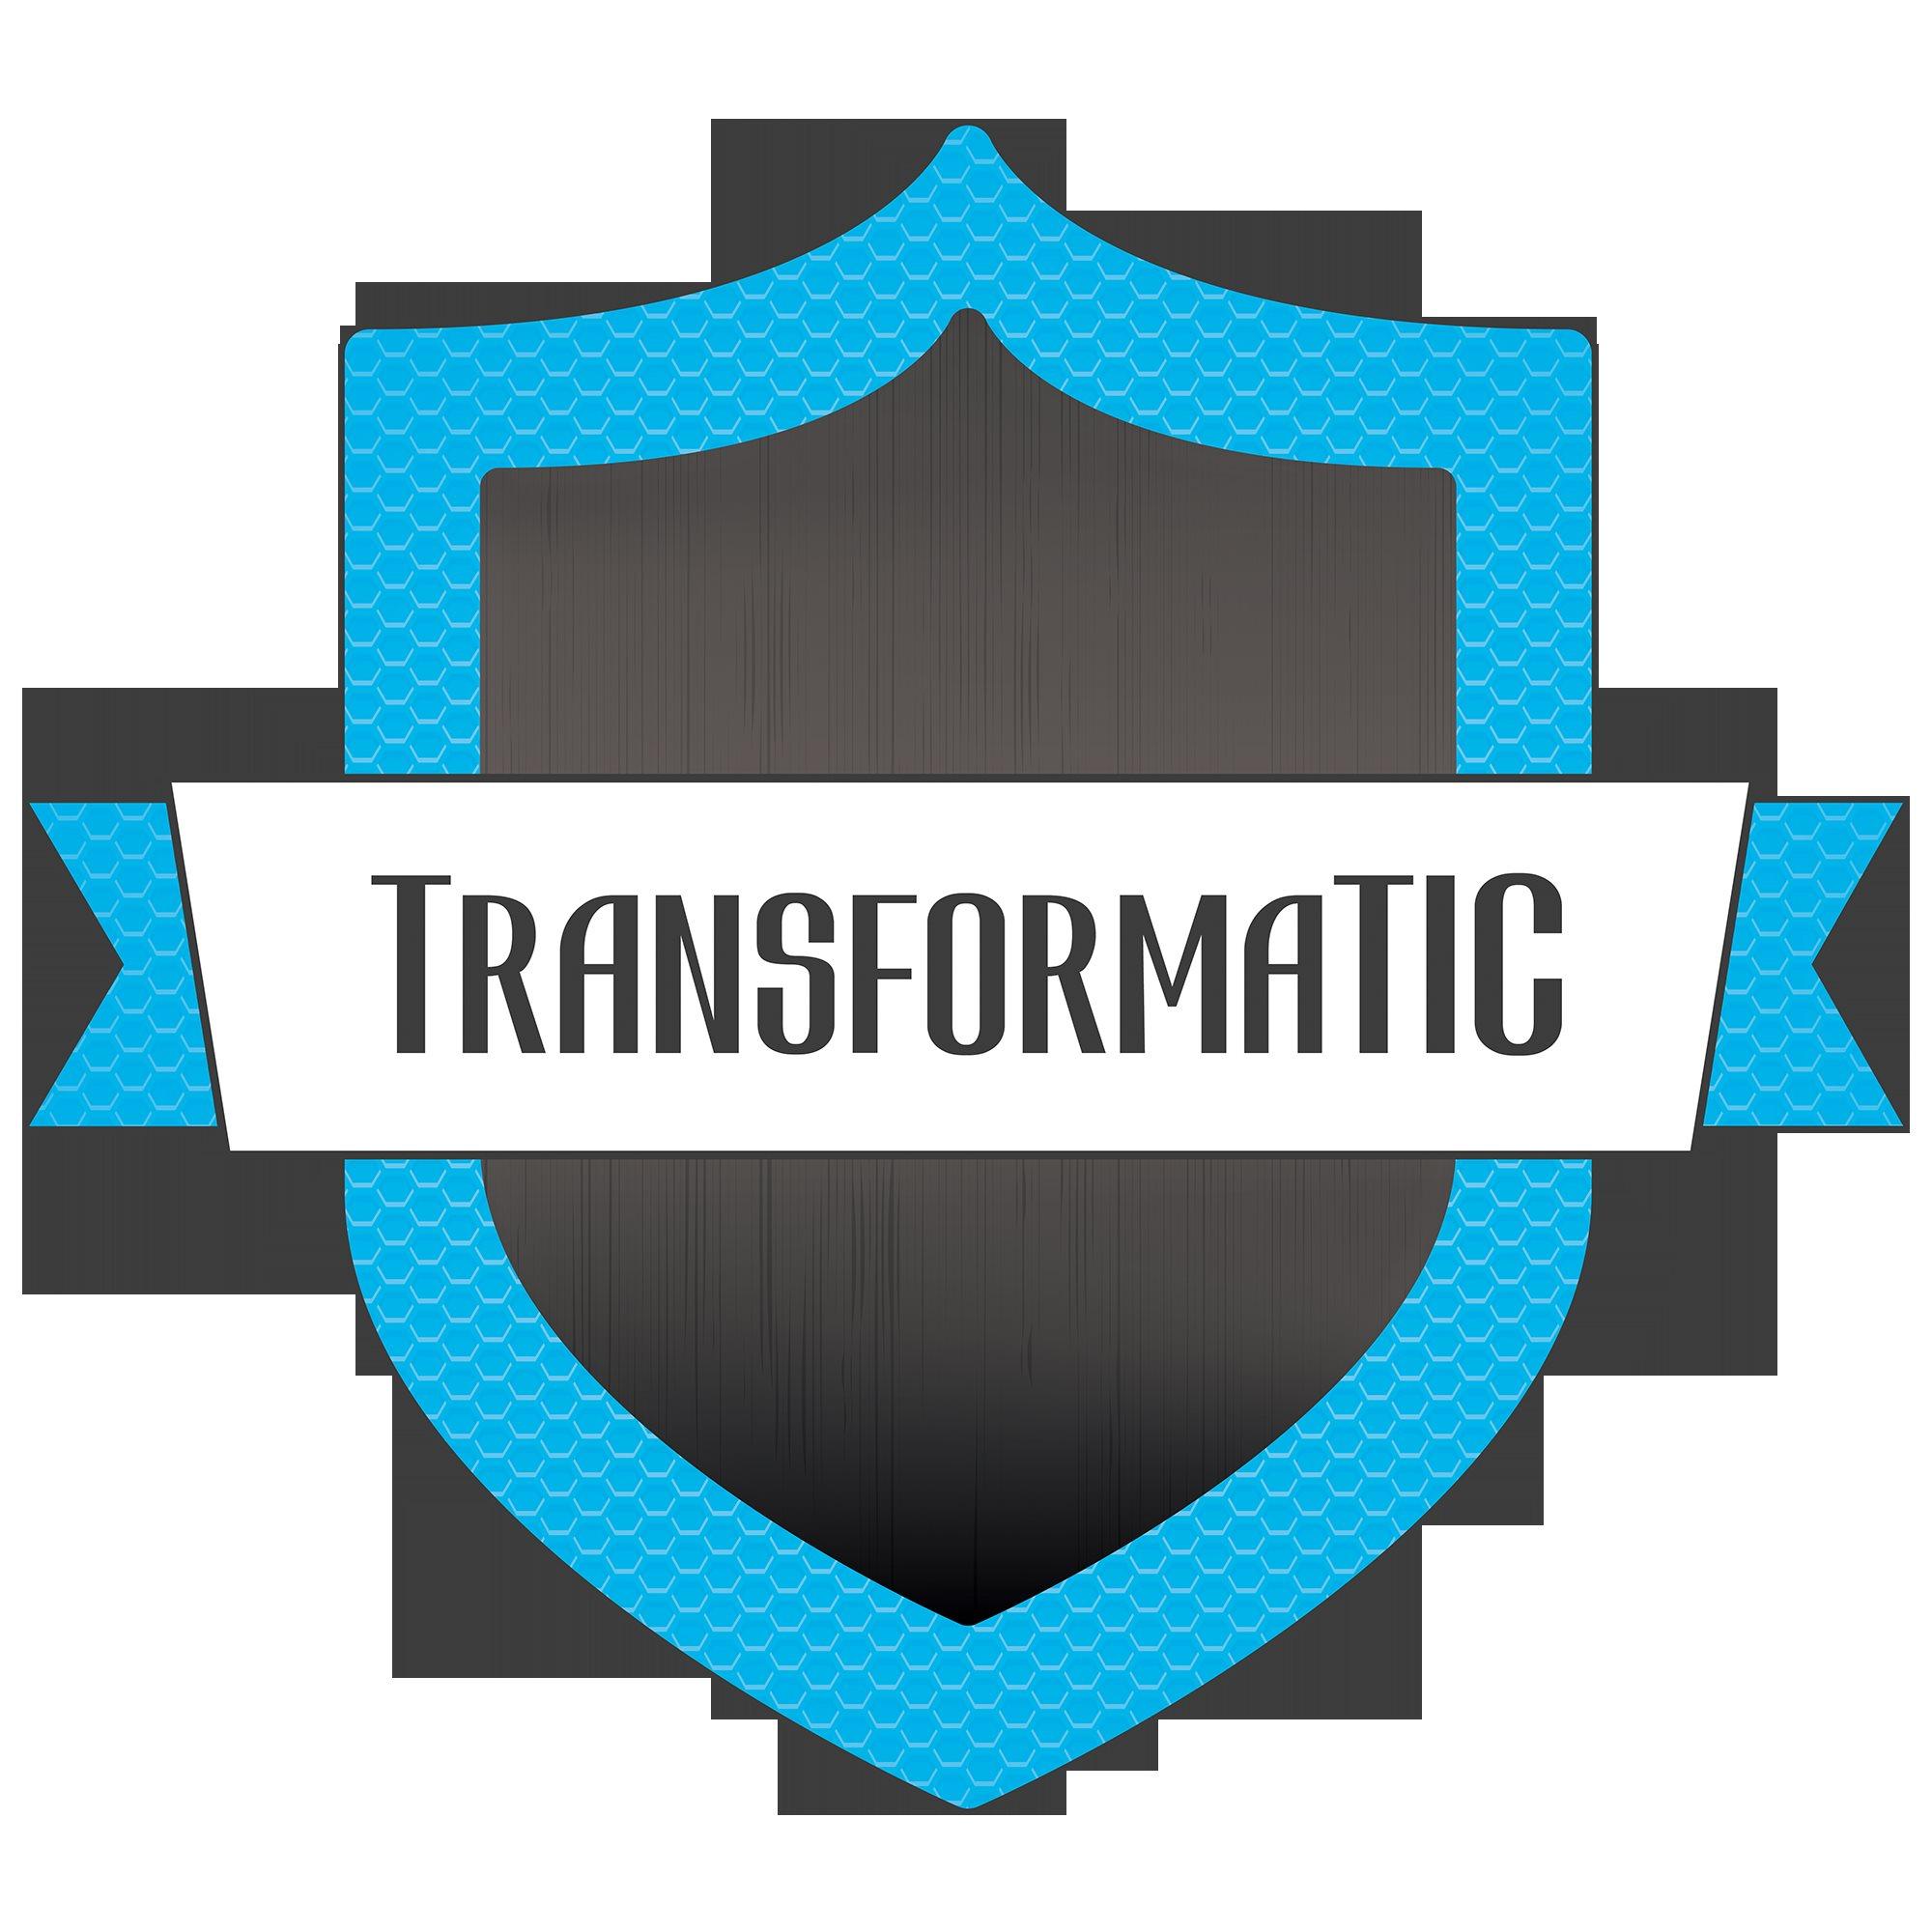 TRANSFORMATIC